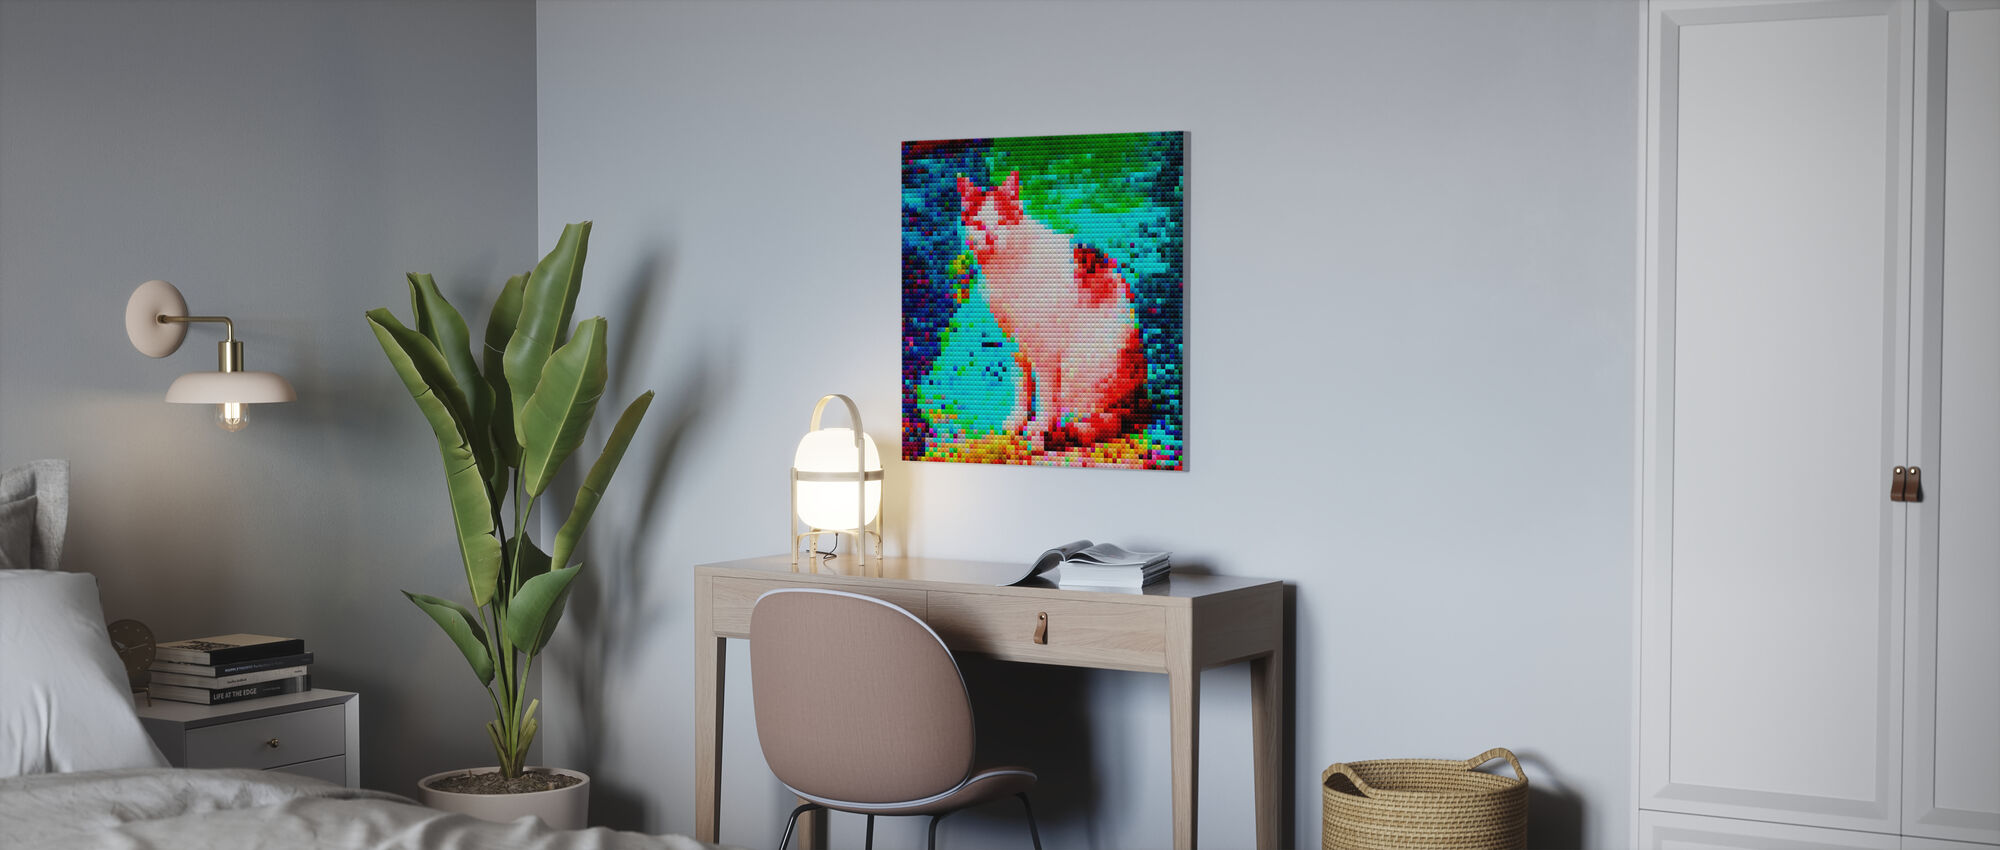 Mosaic Cat - Canvas print - Office